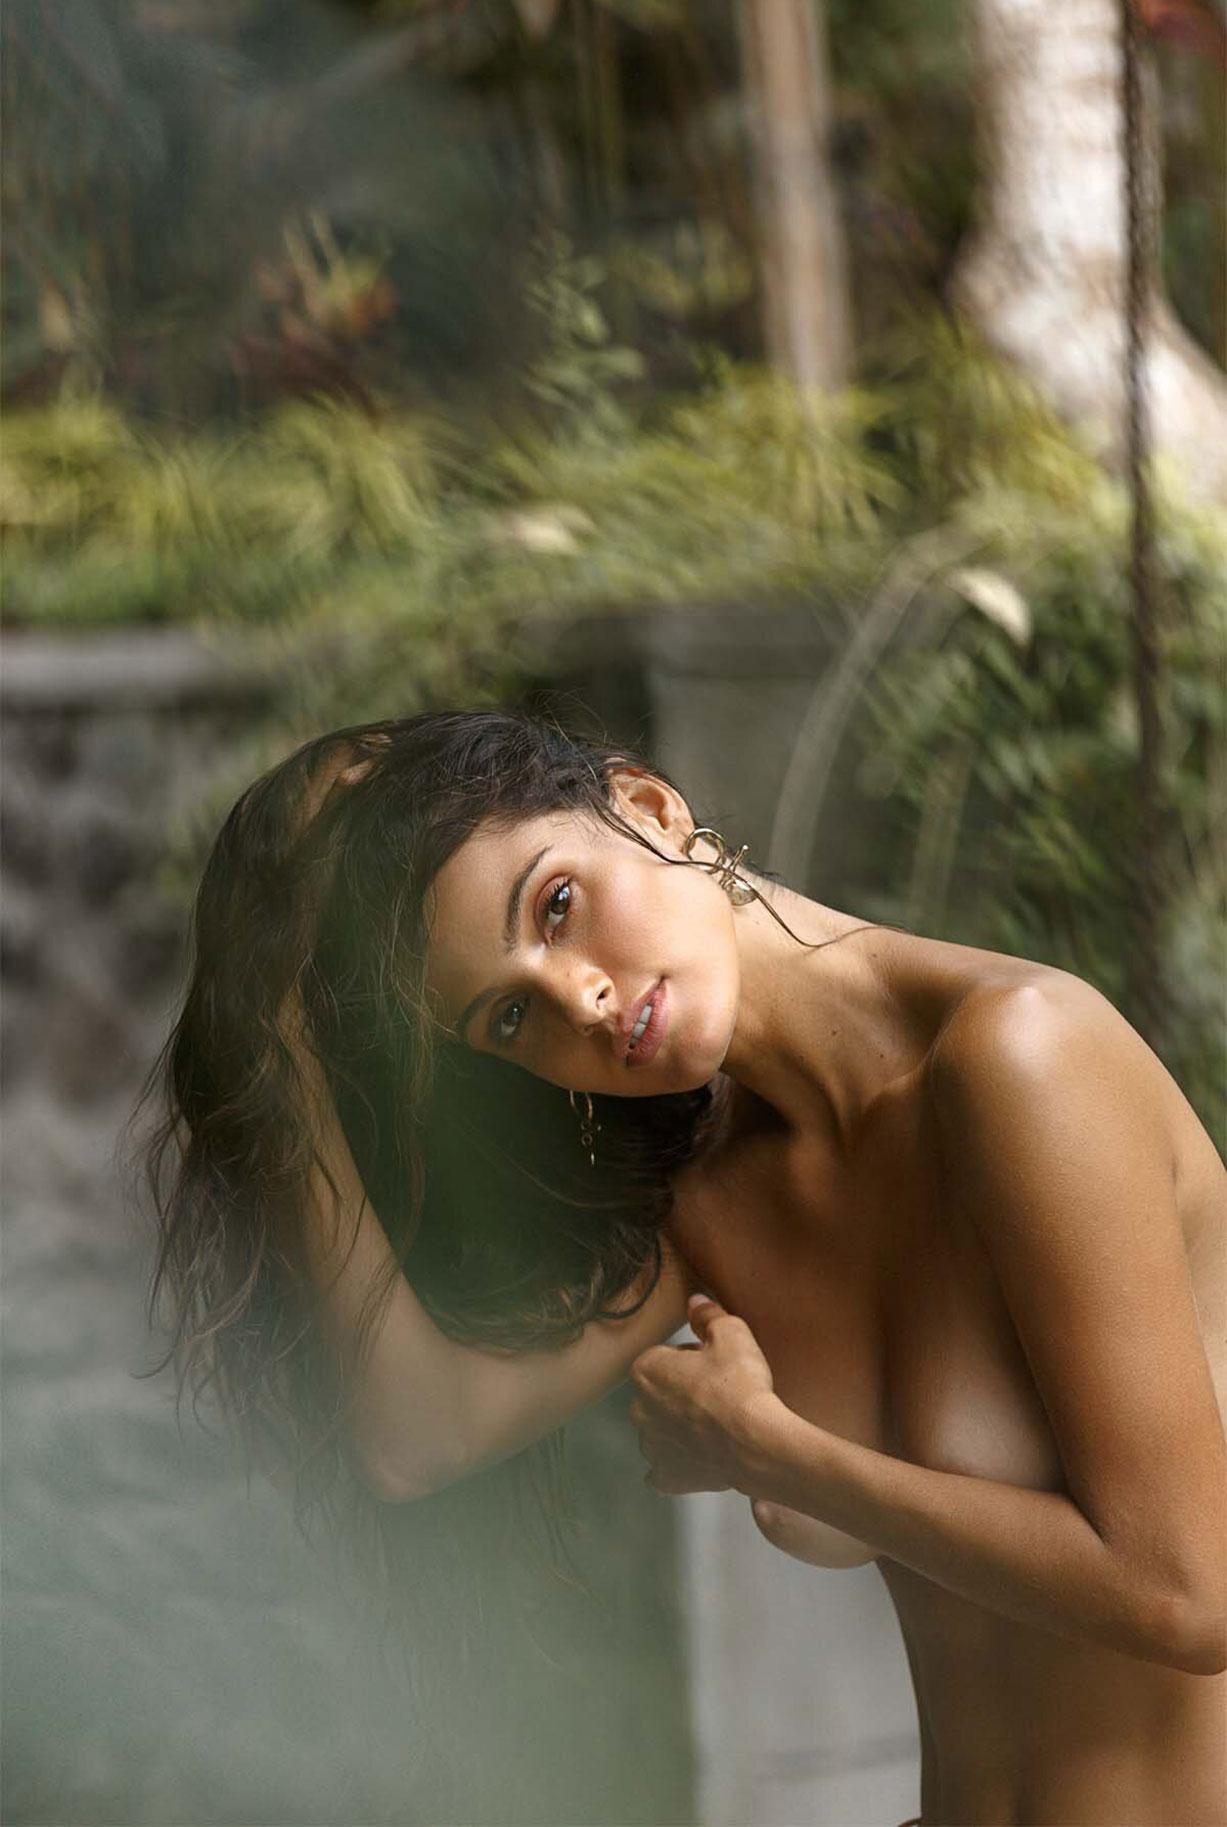 Найара Лима отдыхает у бассейна на Бали / фото 11